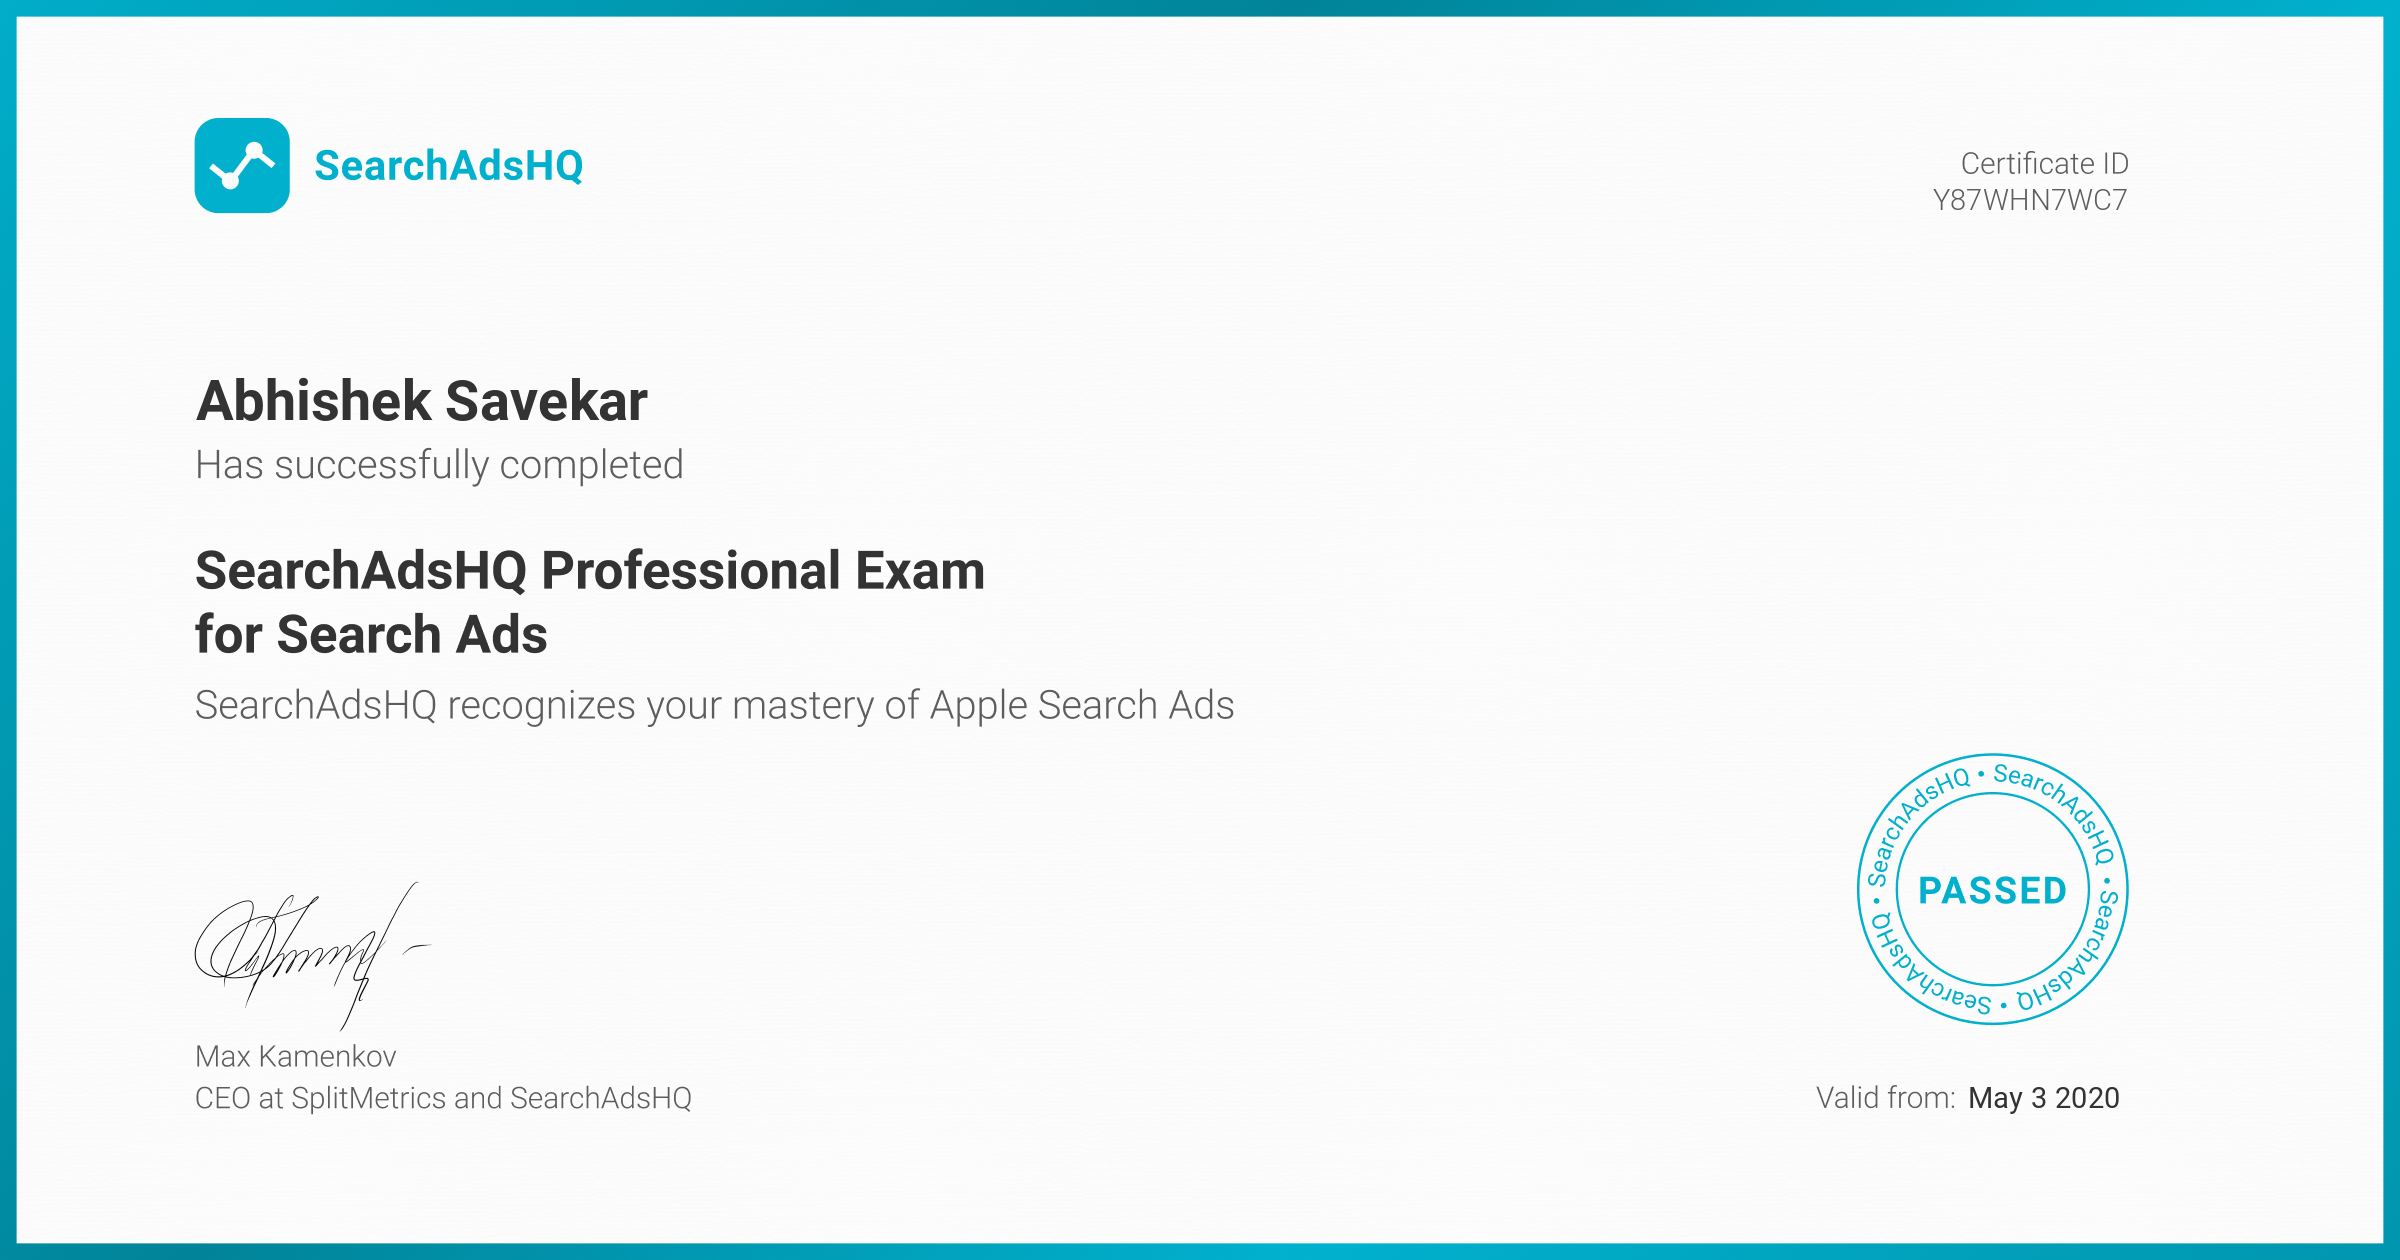 Certificate for Abhishek Savekar | SearchAdsHQ Professional Exam for Search Ads